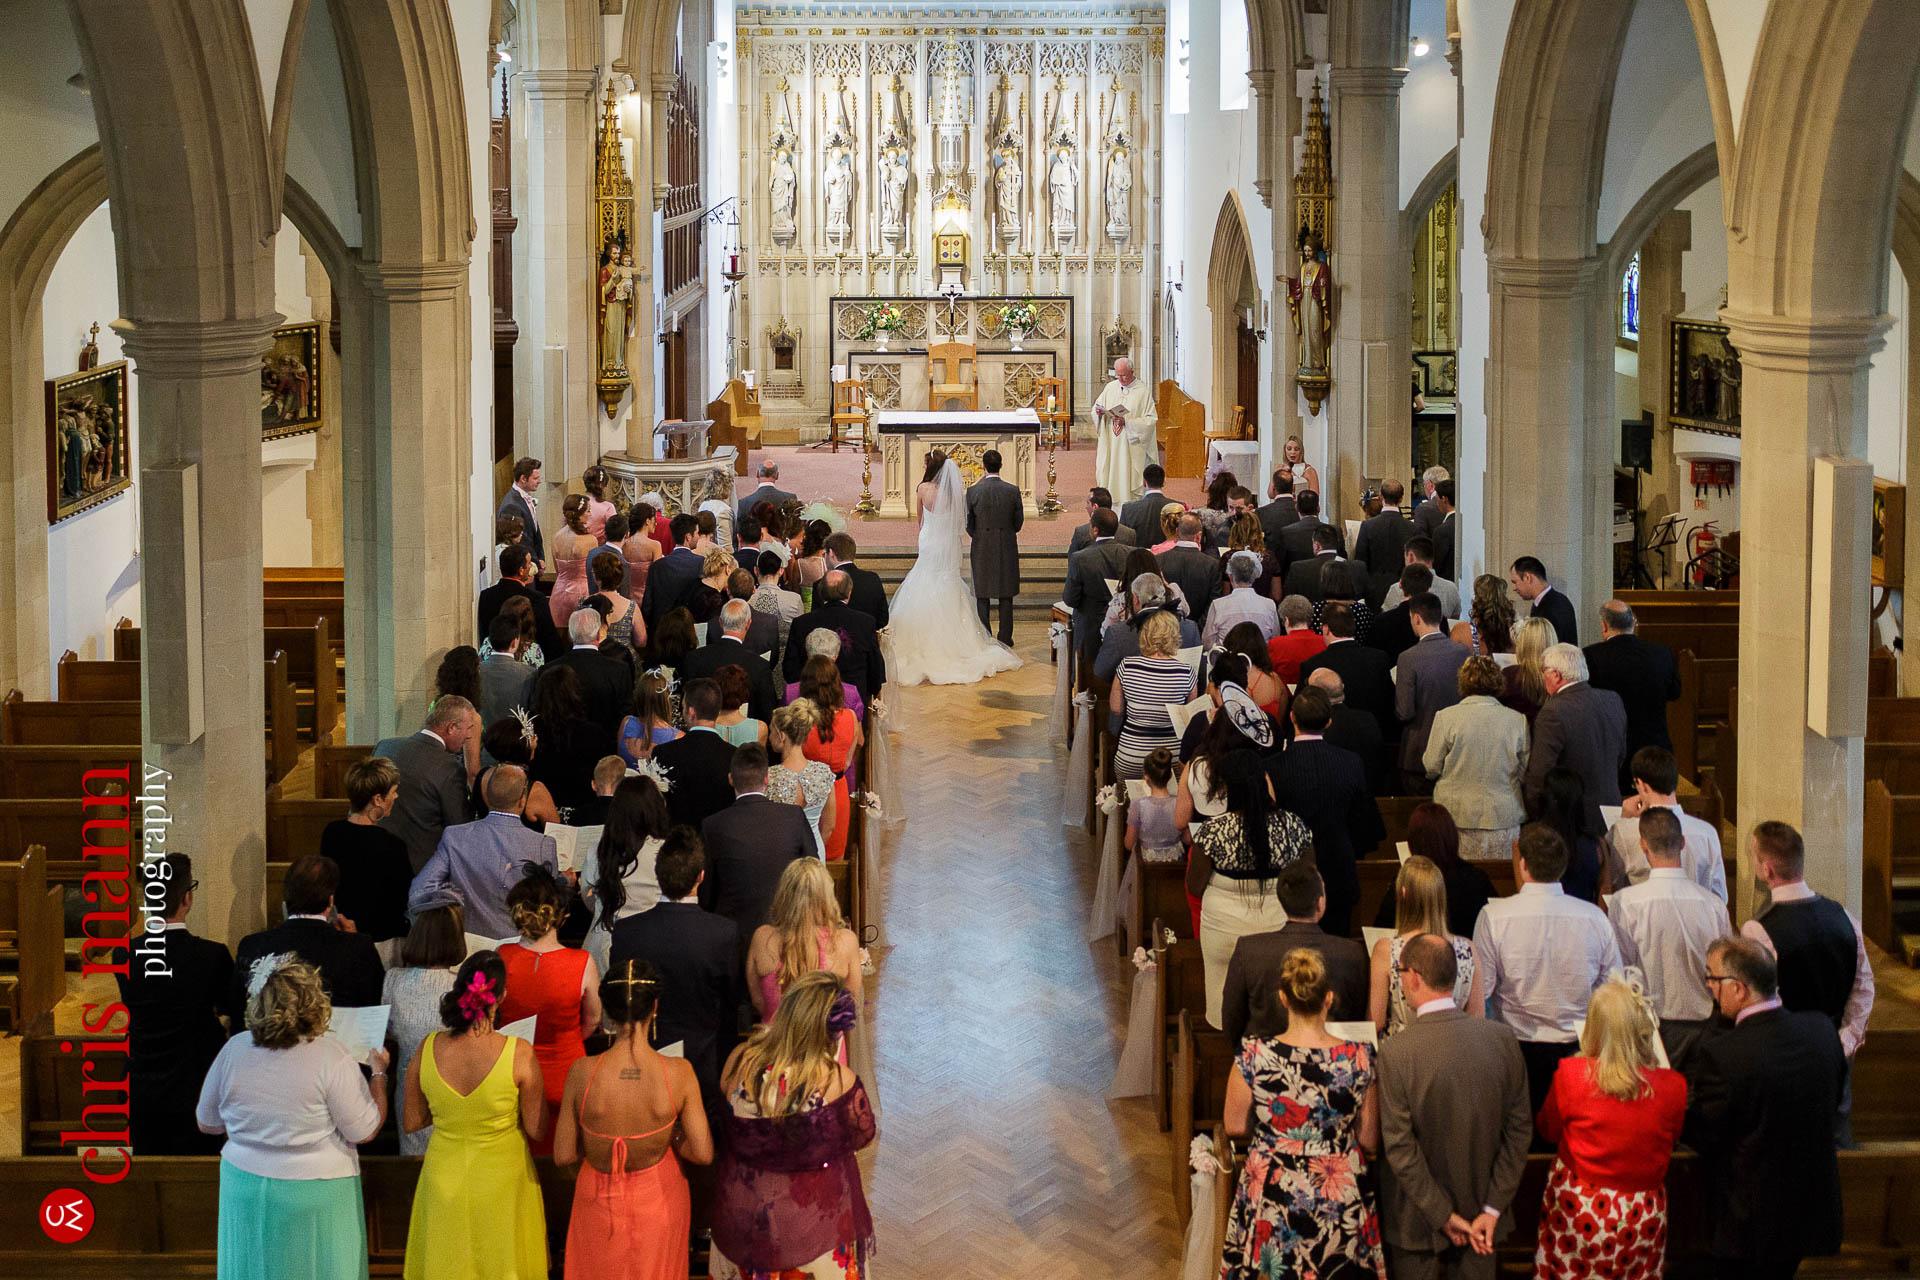 Brocket-Hall-wedding-photography-011